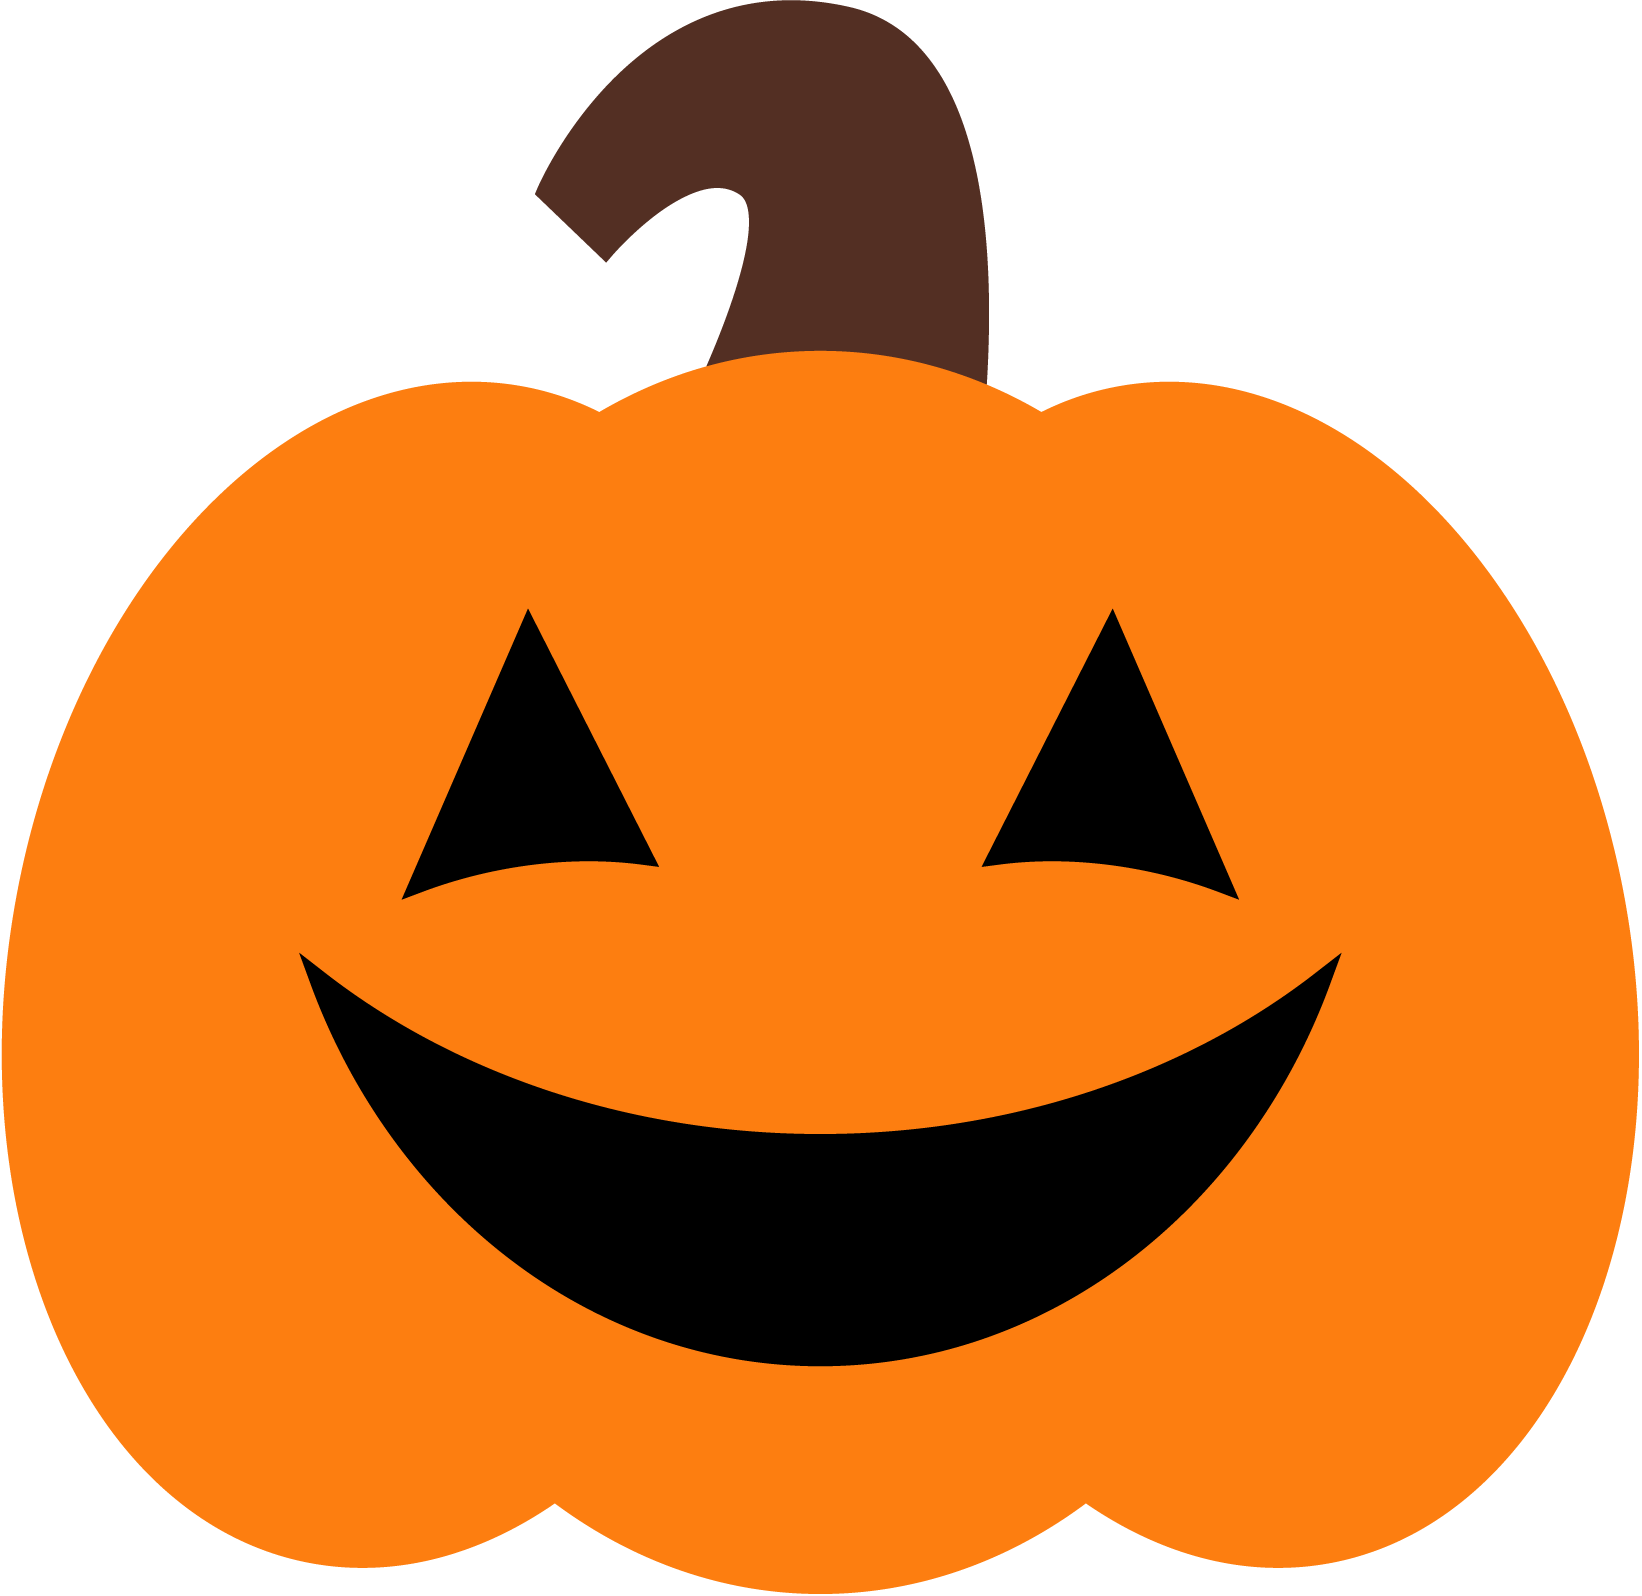 1642x1596 Halloween Pumpkin Clip Art Many Interesting Cliparts